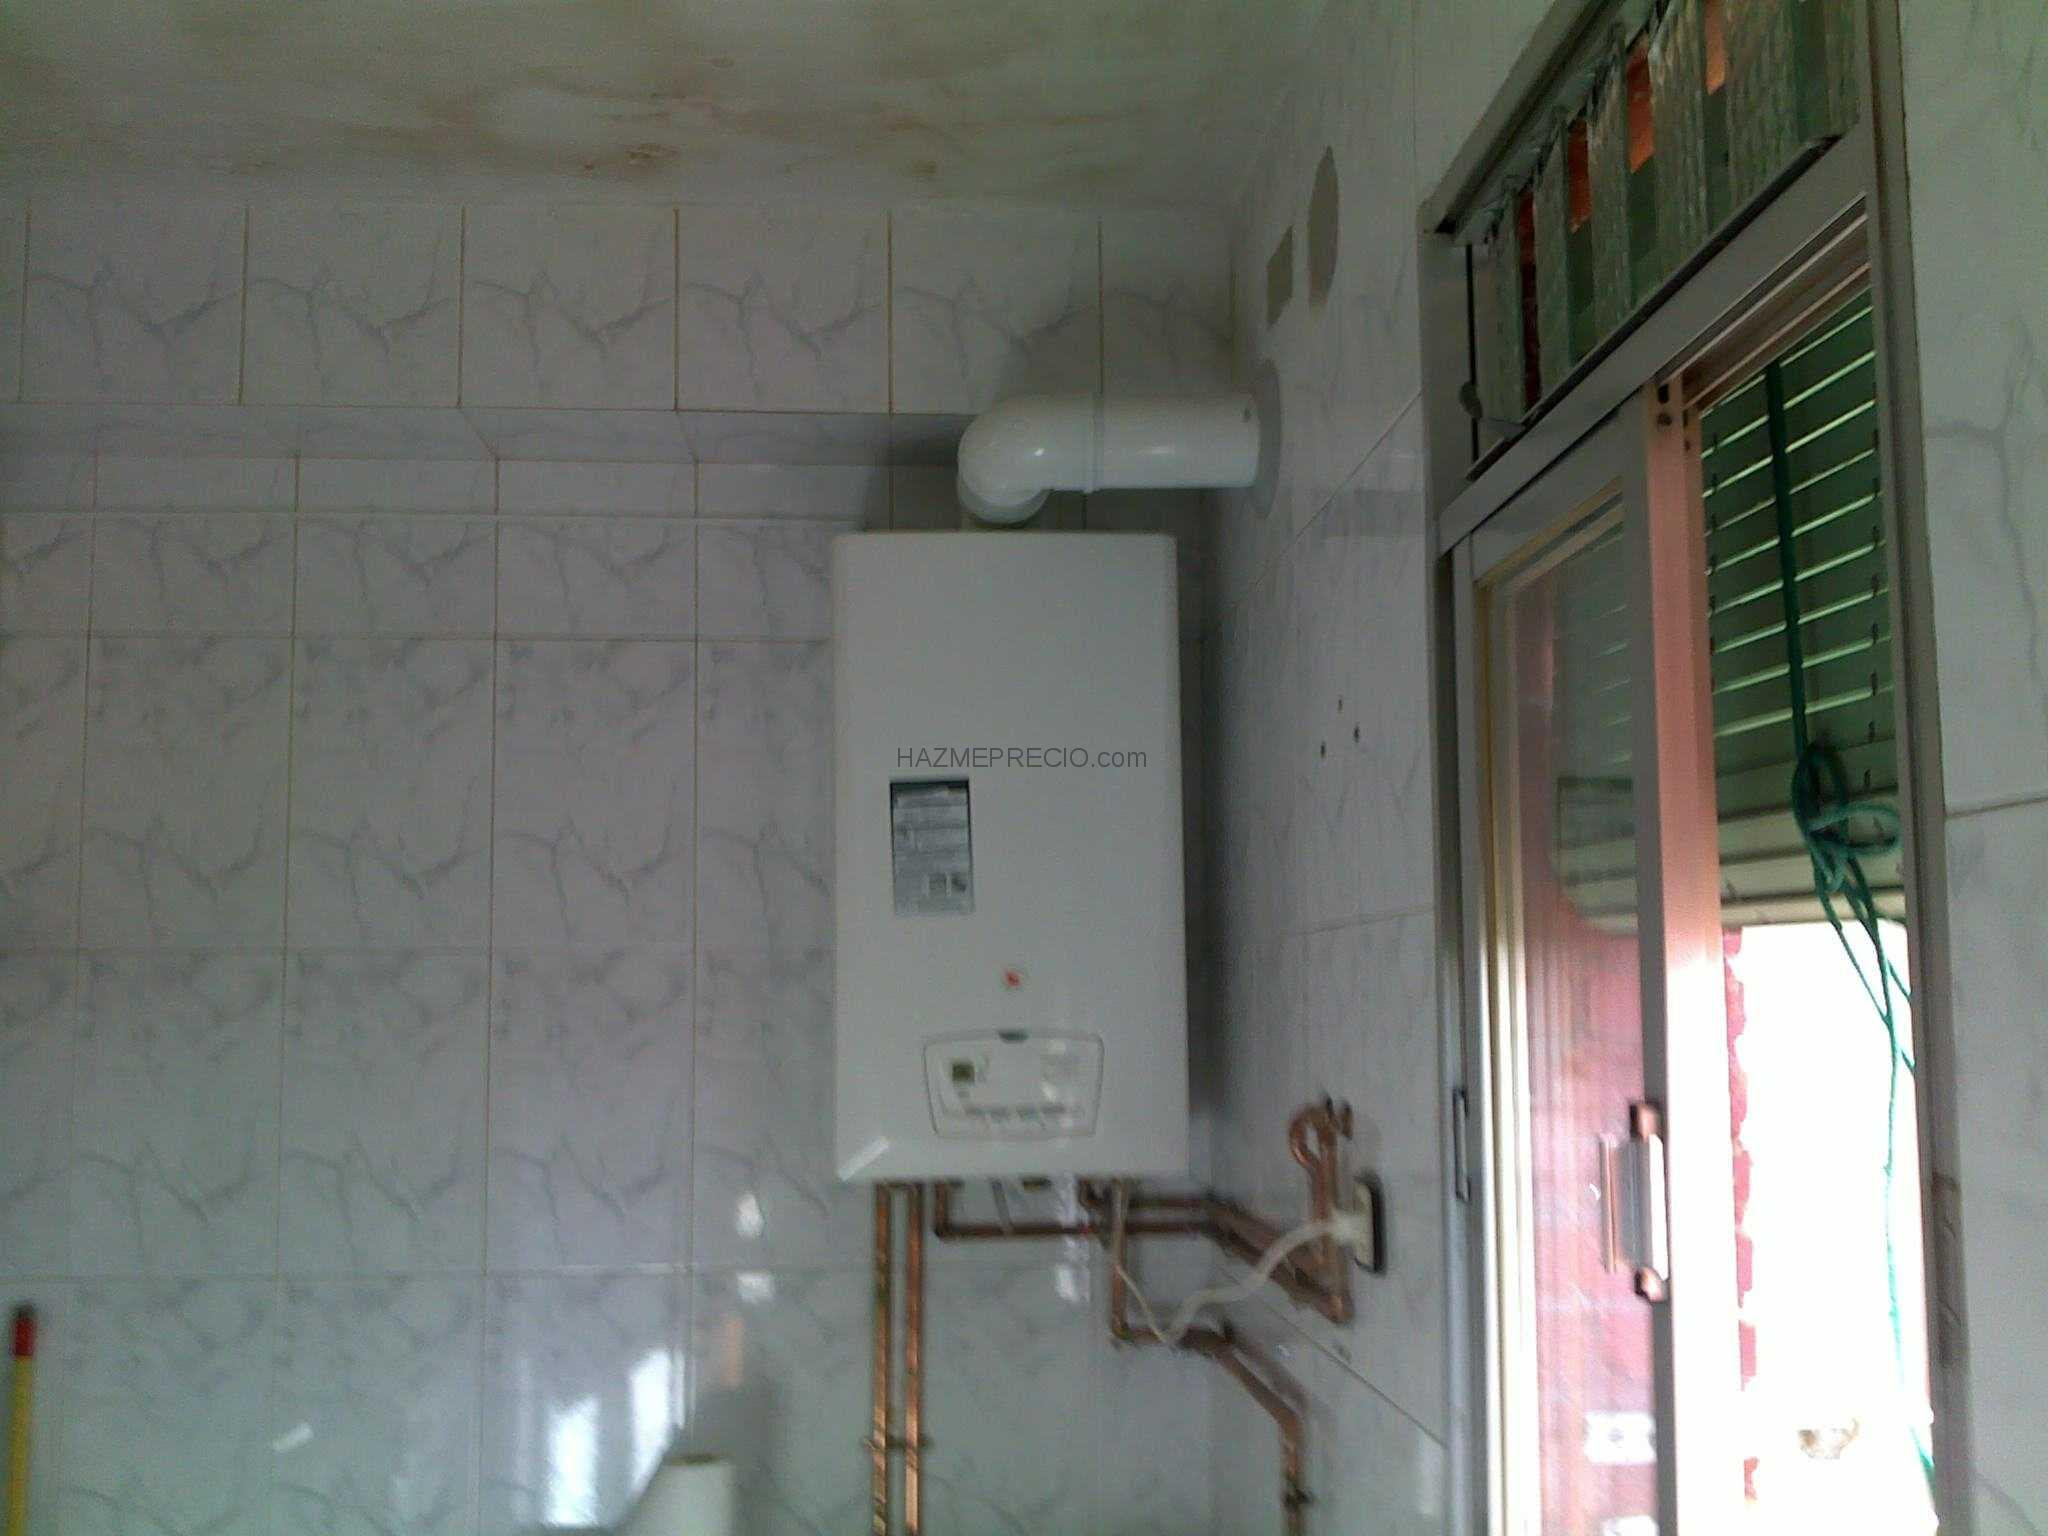 Aire acondicionado split calderas de calefacci n de gas for Caldera mural a gas